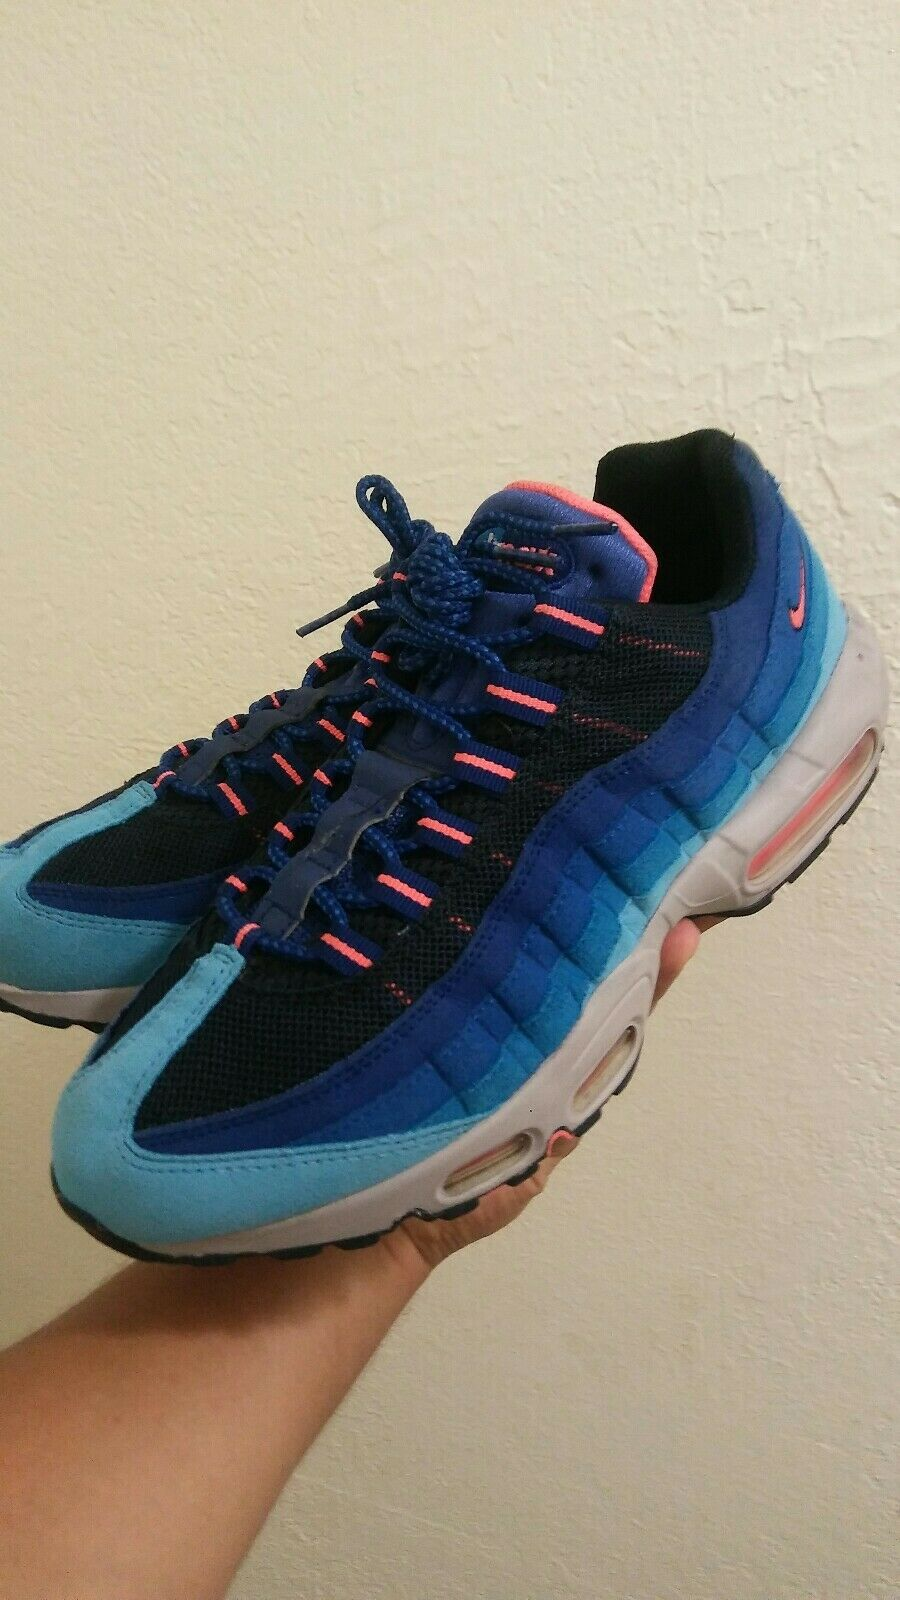 Nike Air Max 95 Multi color Size 9